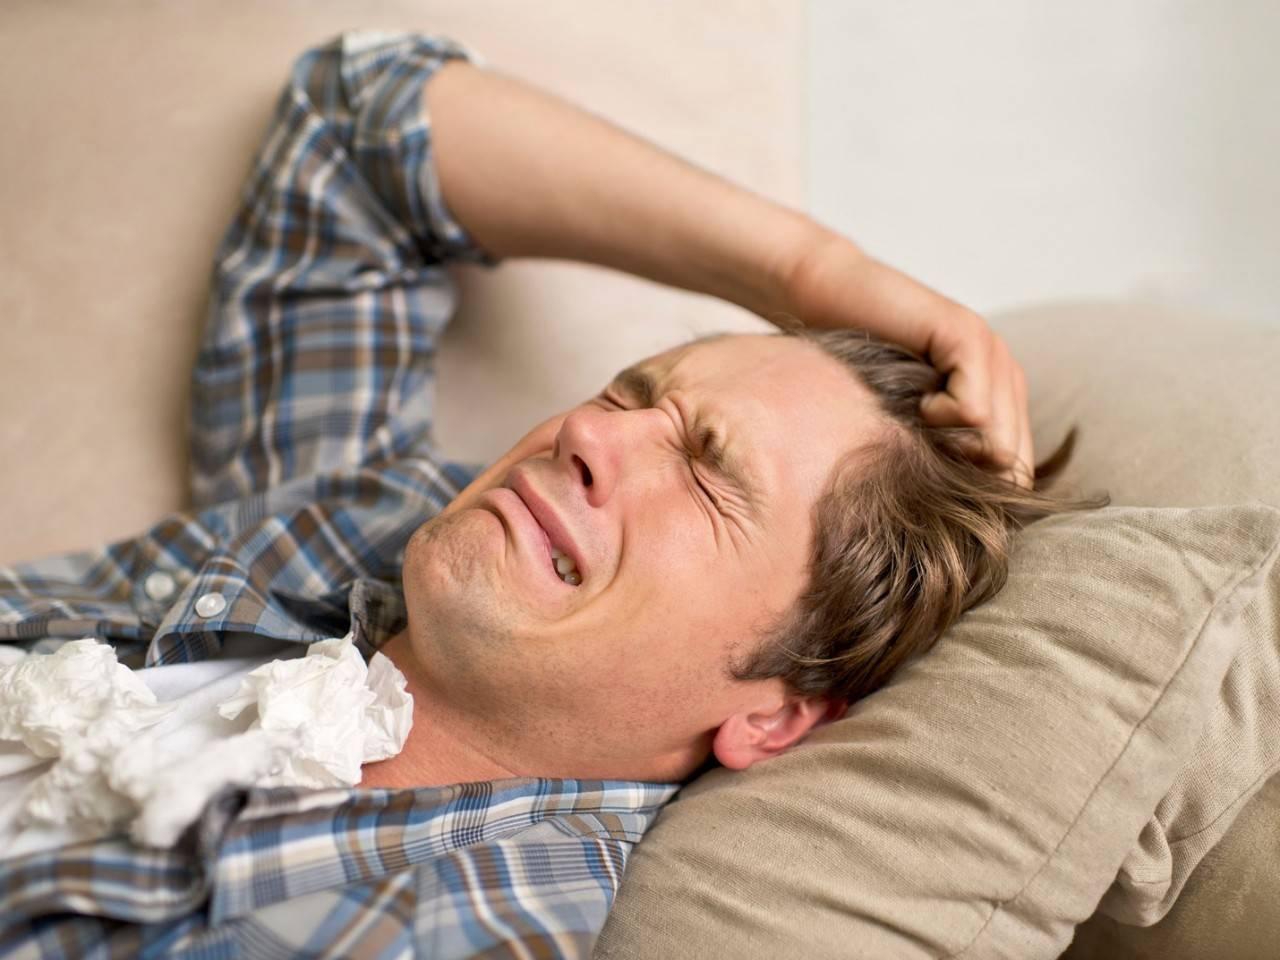 13 симптомов депрессии у мужчин